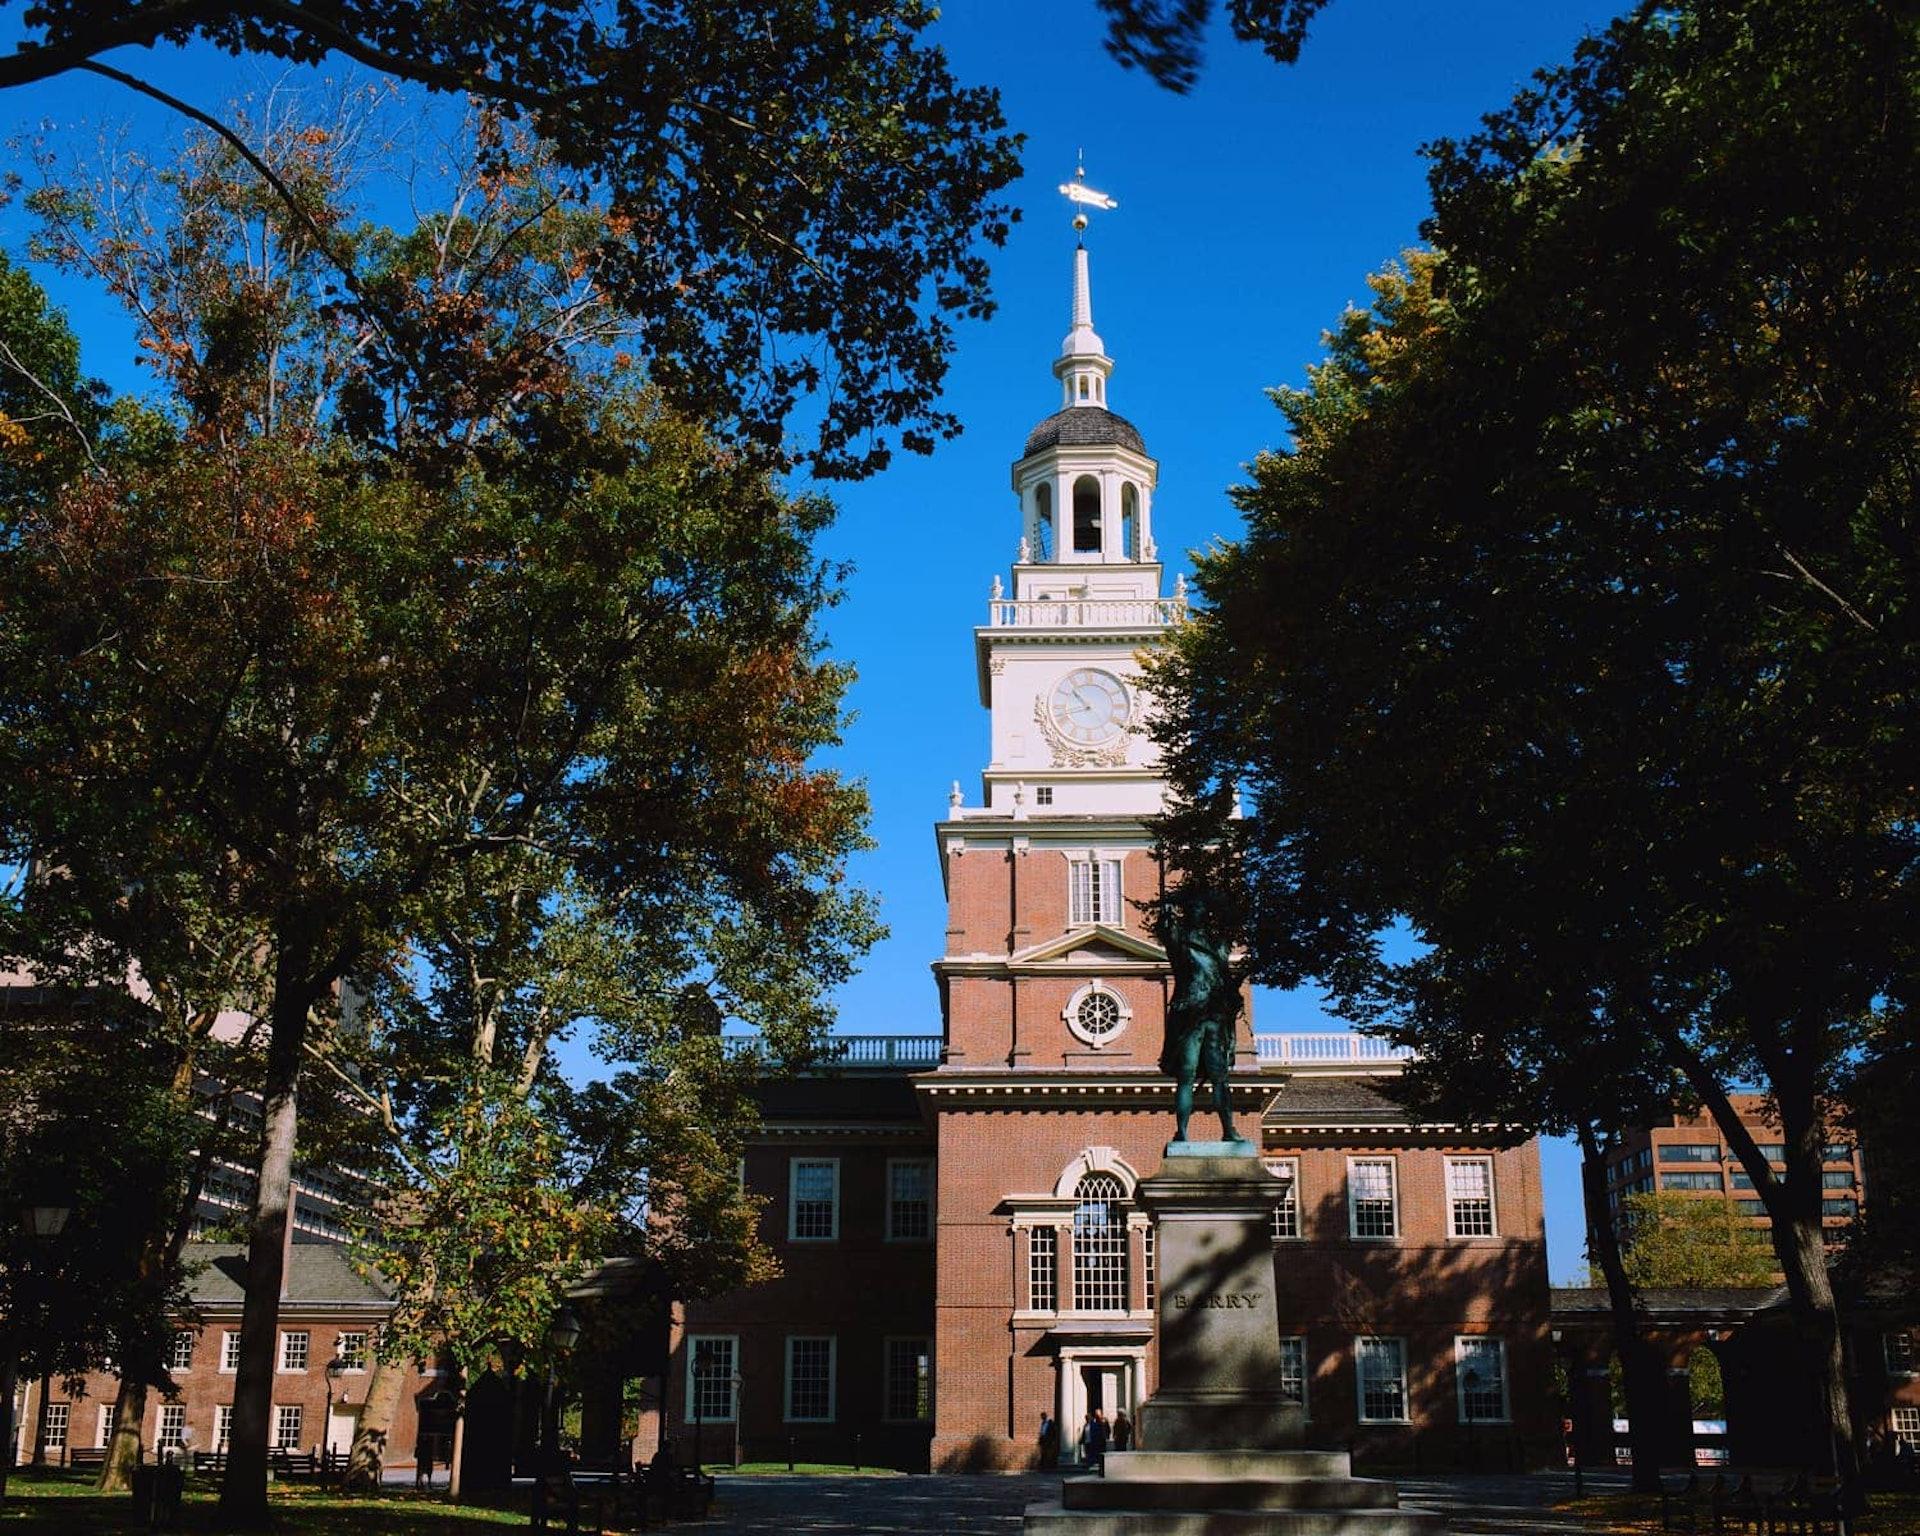 Building and statue in Philadelphia